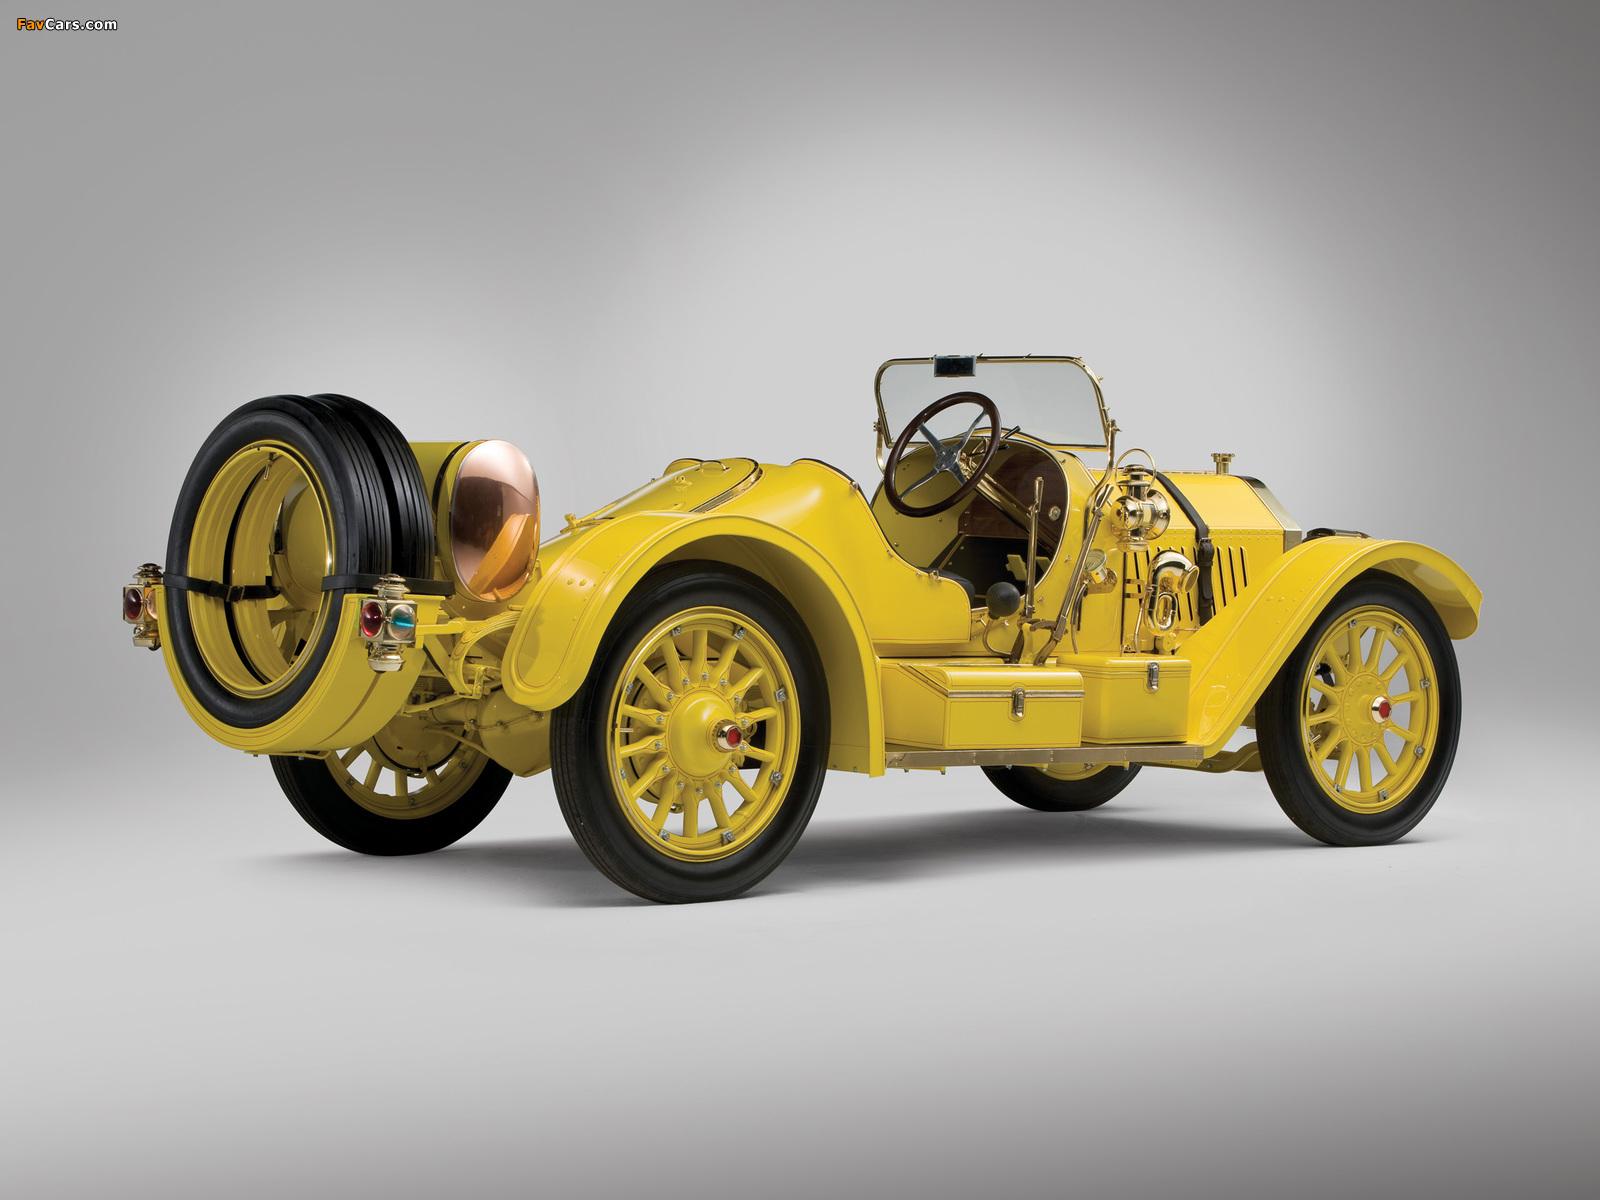 Oldsmobile Autocrat Racing Car 1911 wallpapers (1600 x 1200)